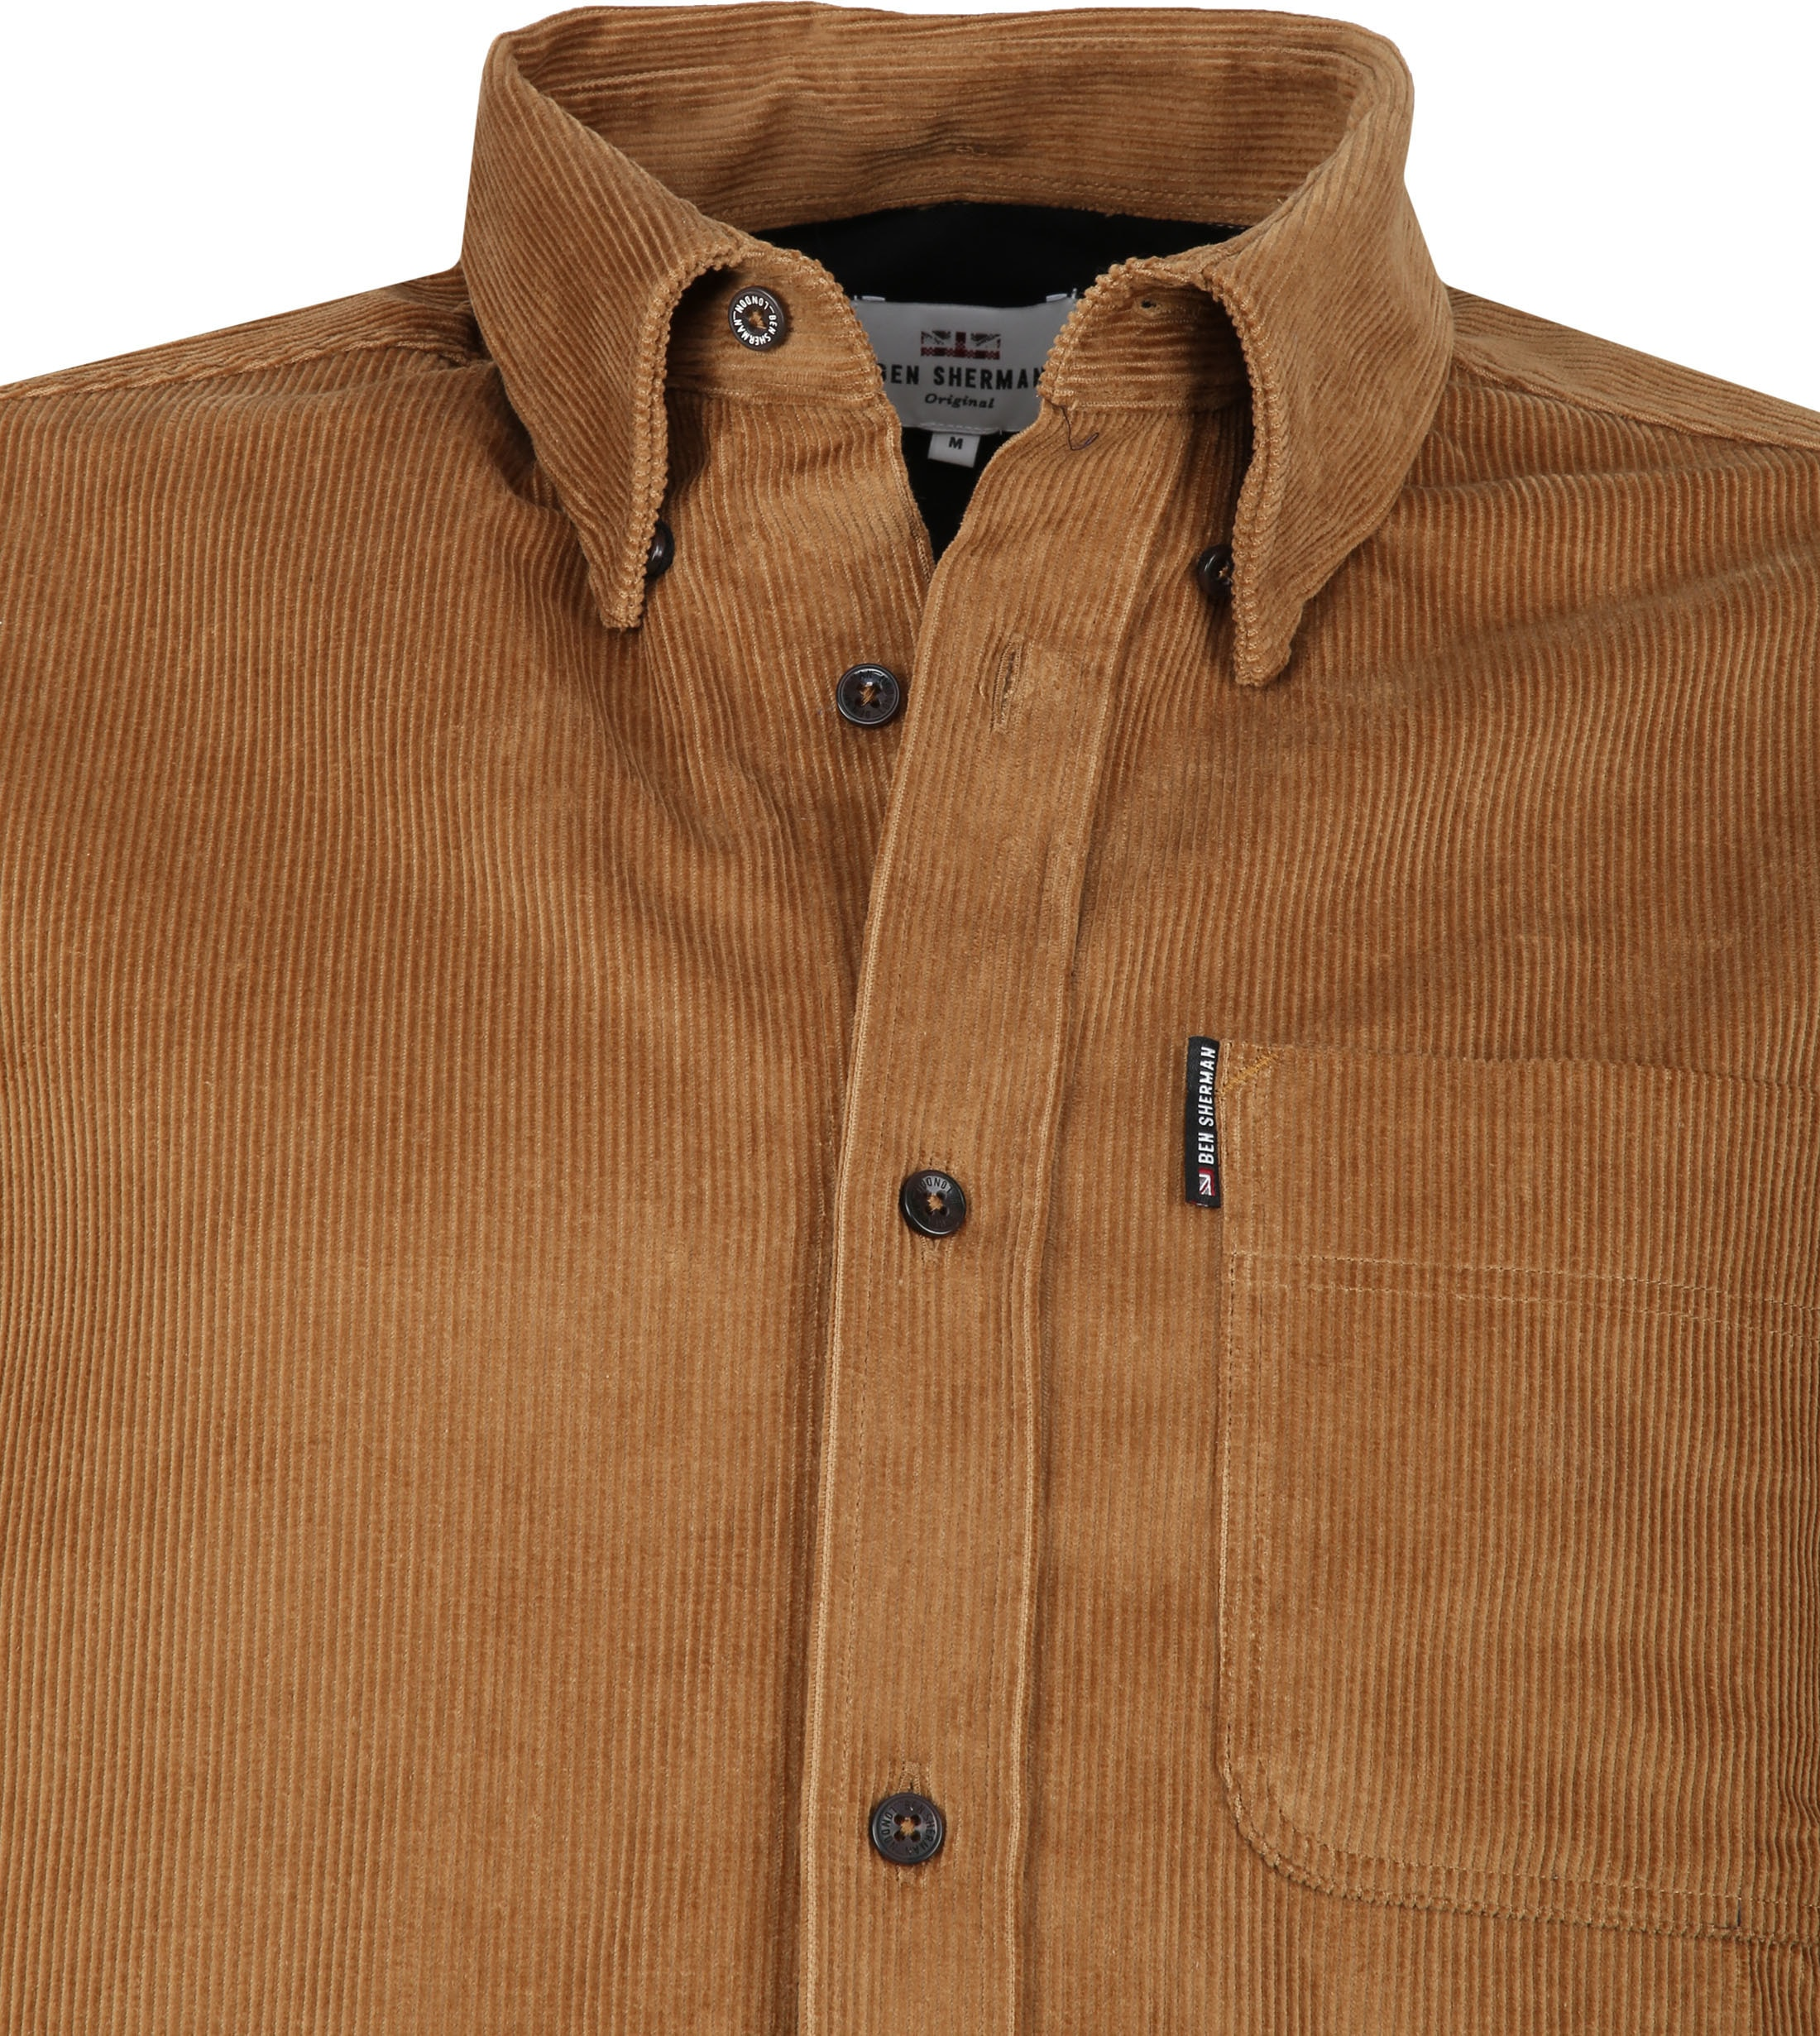 Ben Sherman Shirt Camel photo 1